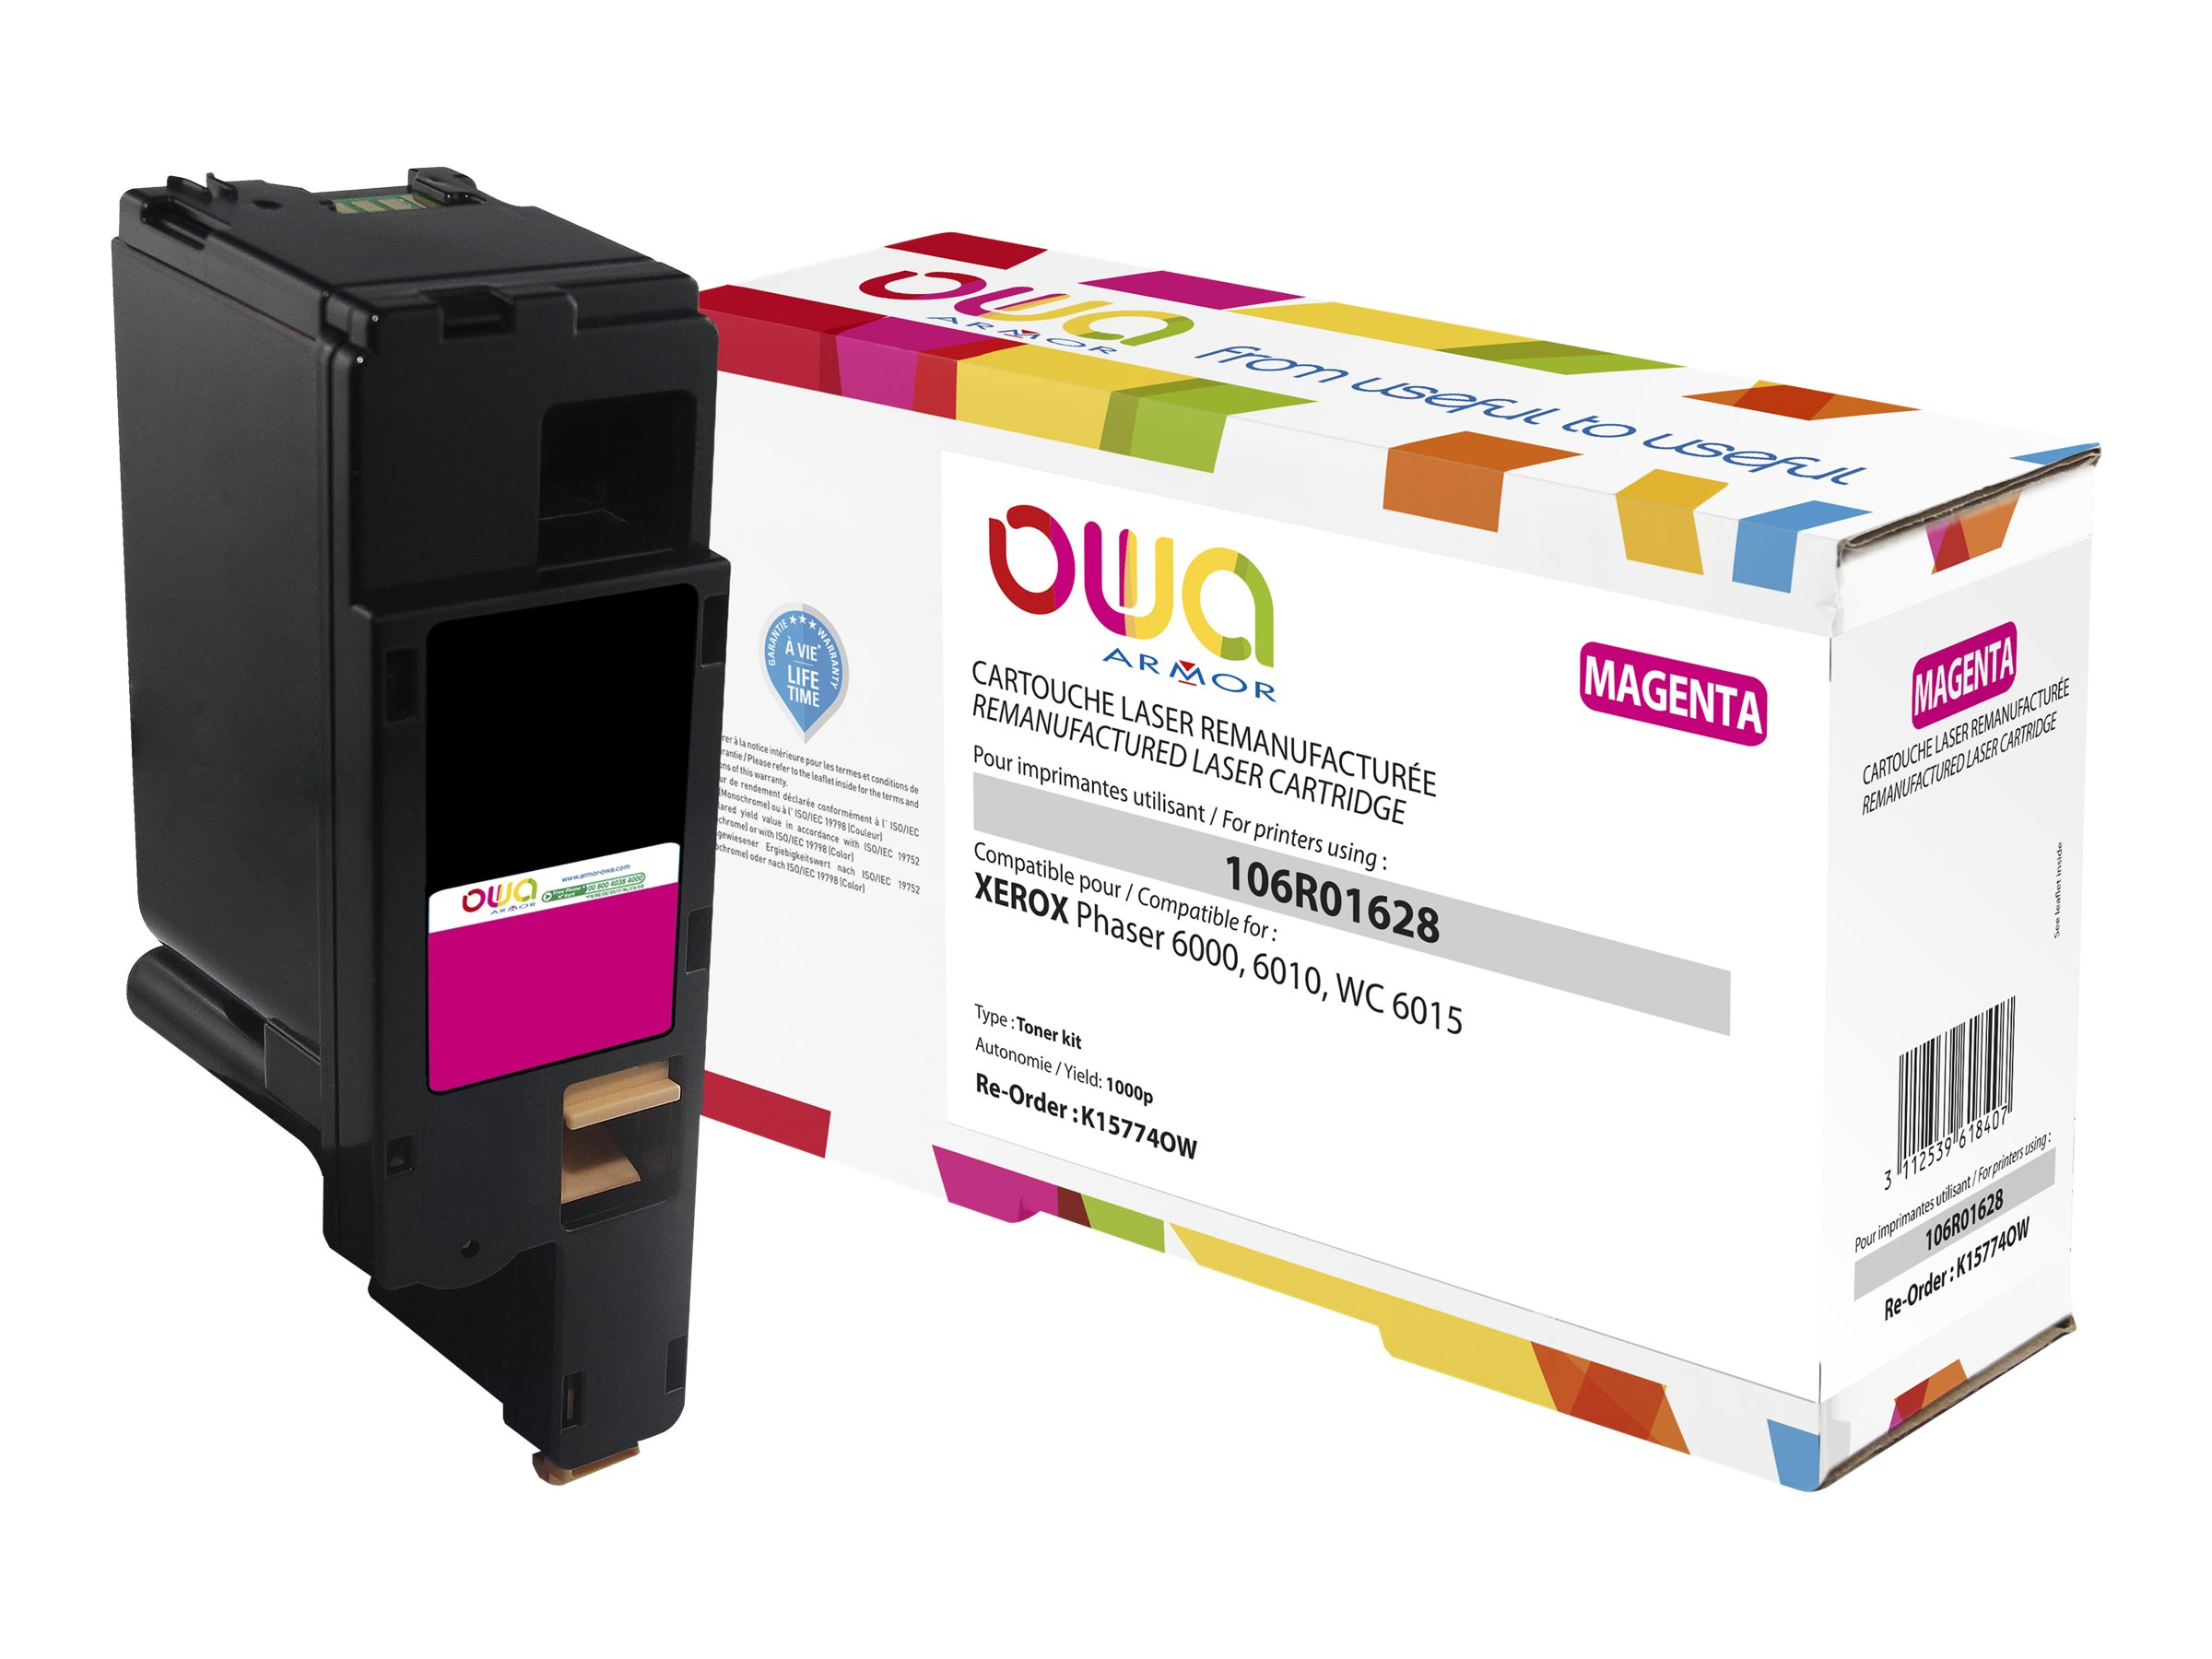 Xerox 106R01628 - remanufacturé OWA K15774OW - magenta - cartouche laser